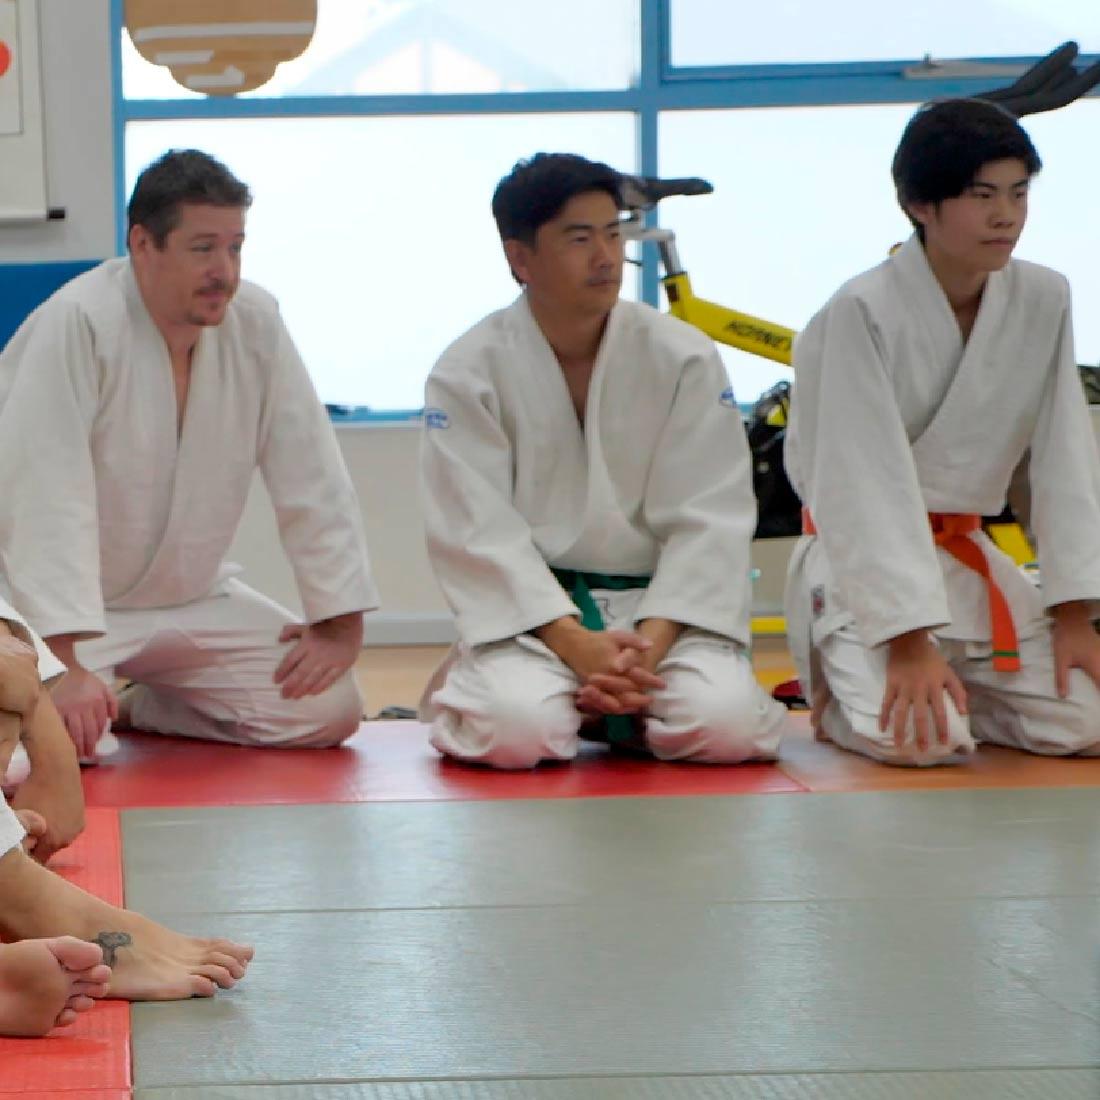 Seacliff Recreation Centre Seacliff - Judo Seniors